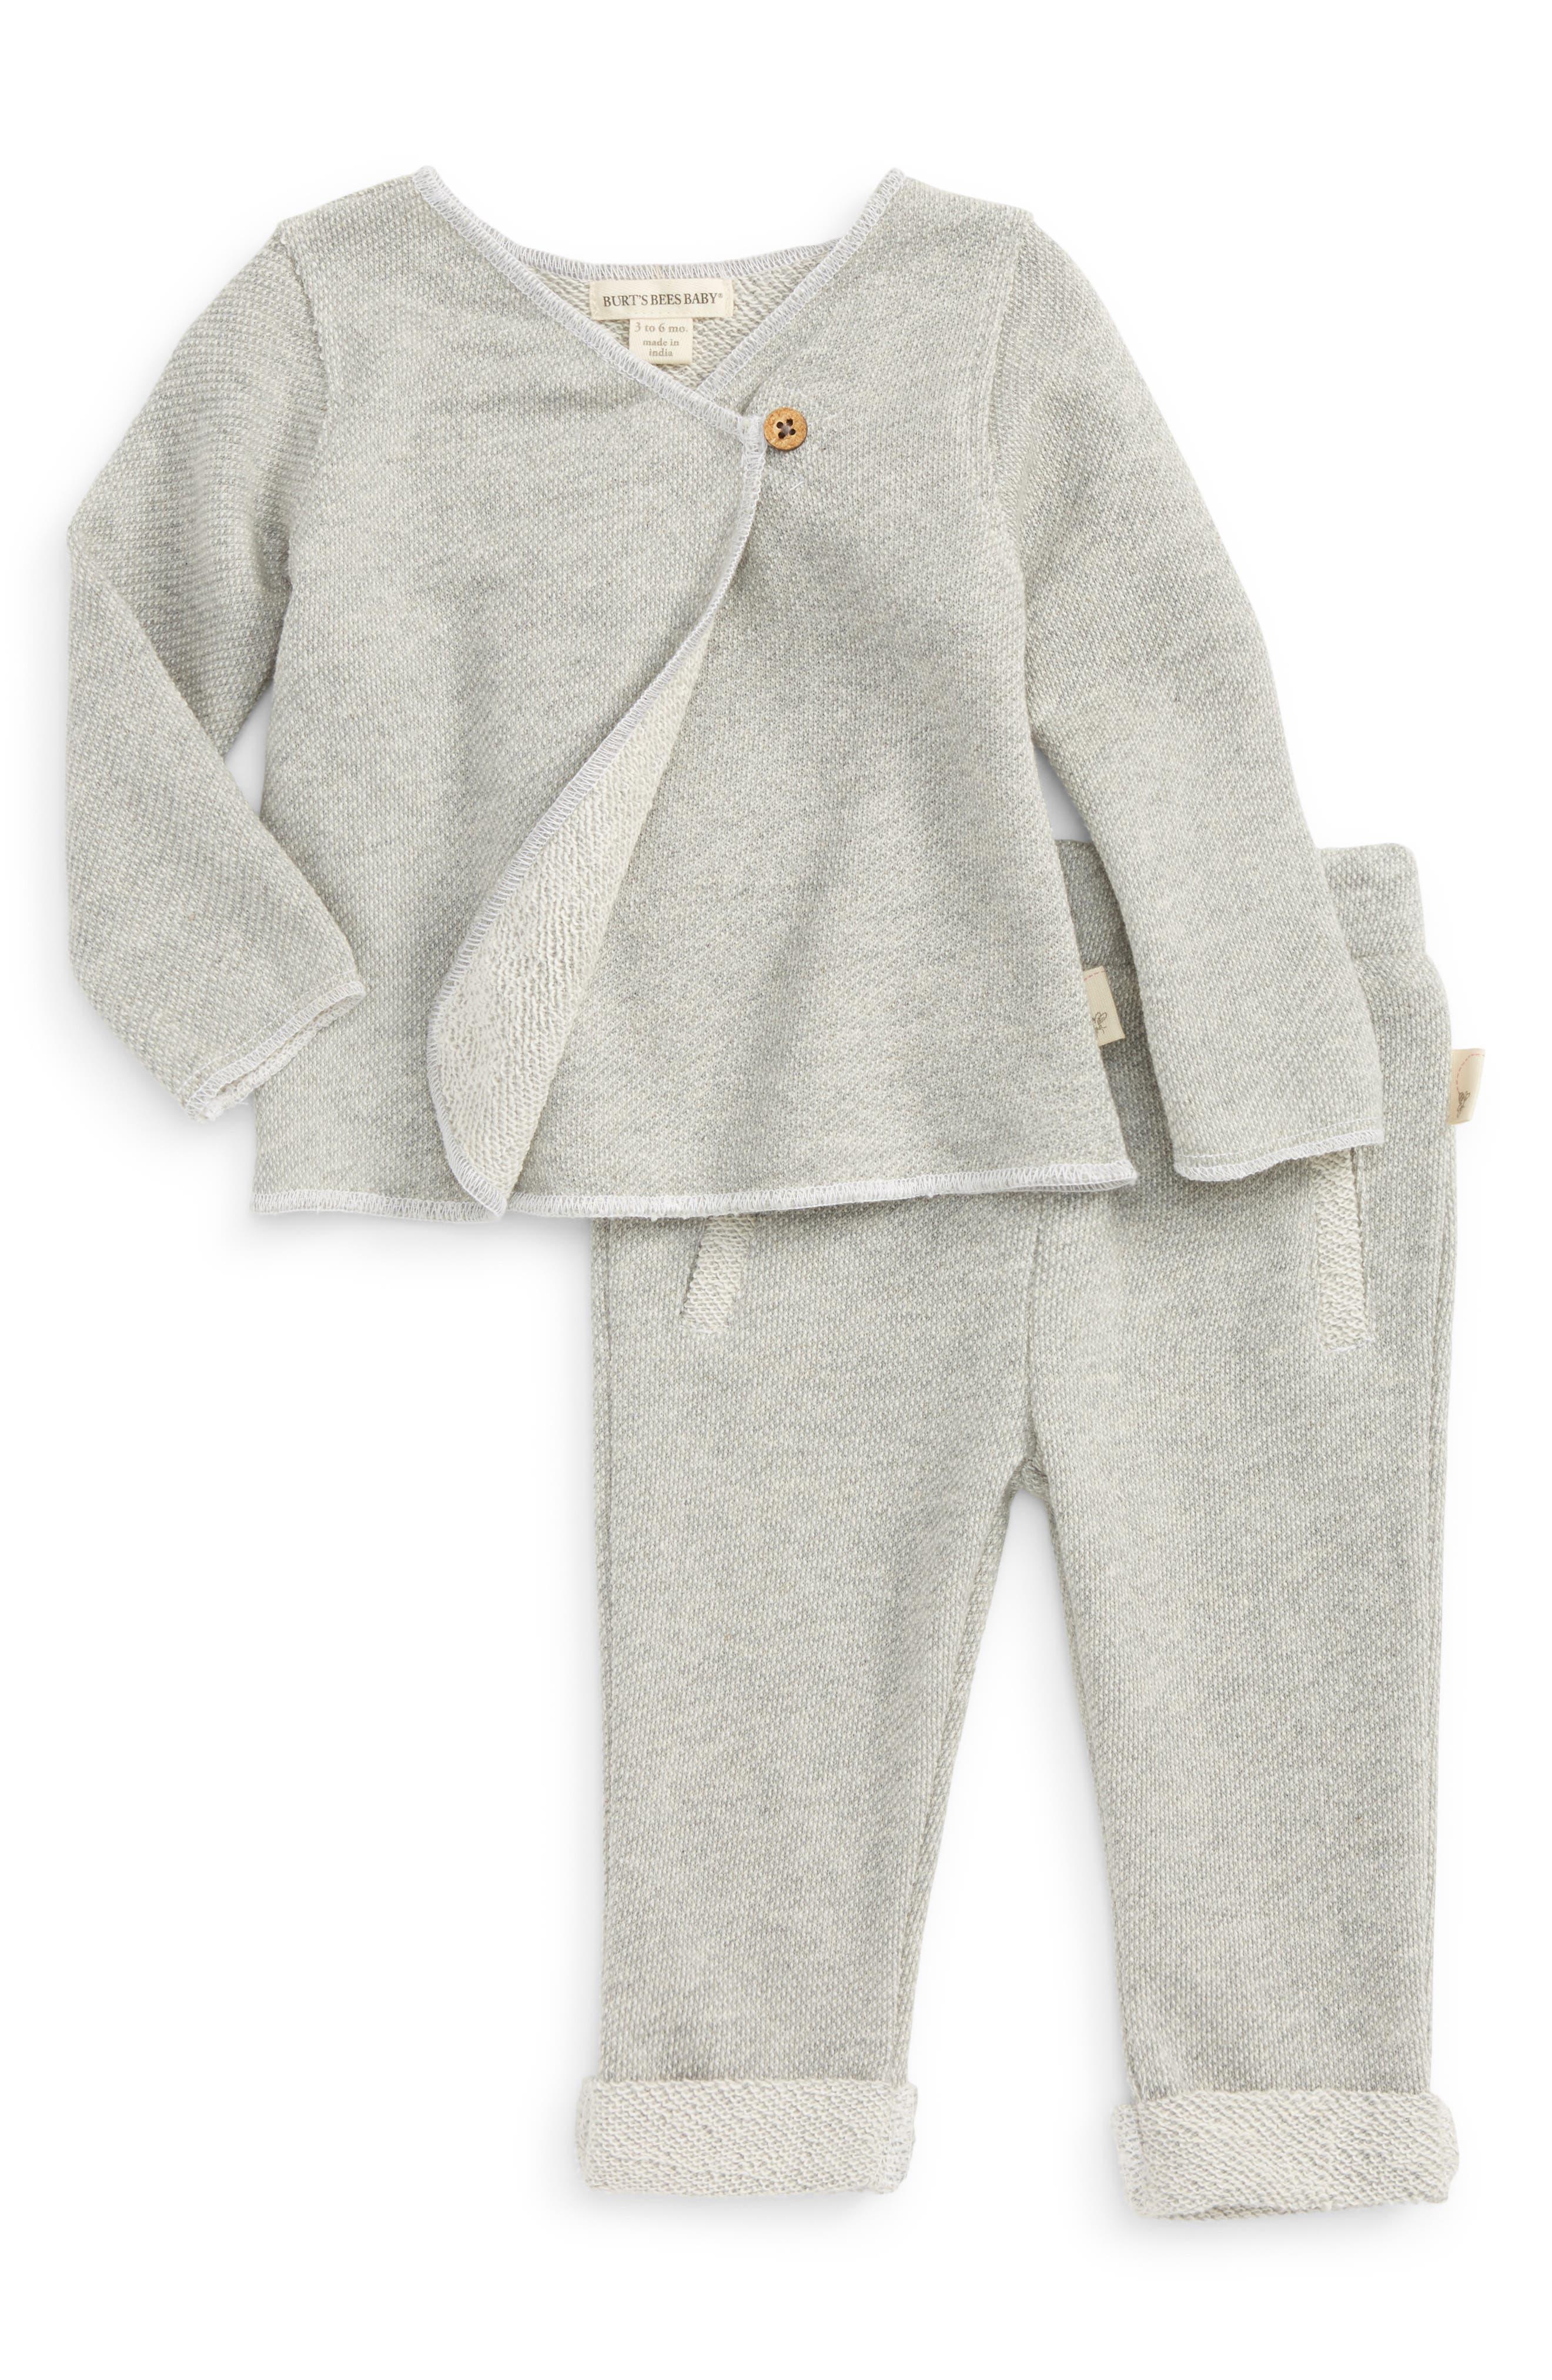 Organic Cotton Kimono Top & Pants Set,                         Main,                         color, Heather Grey